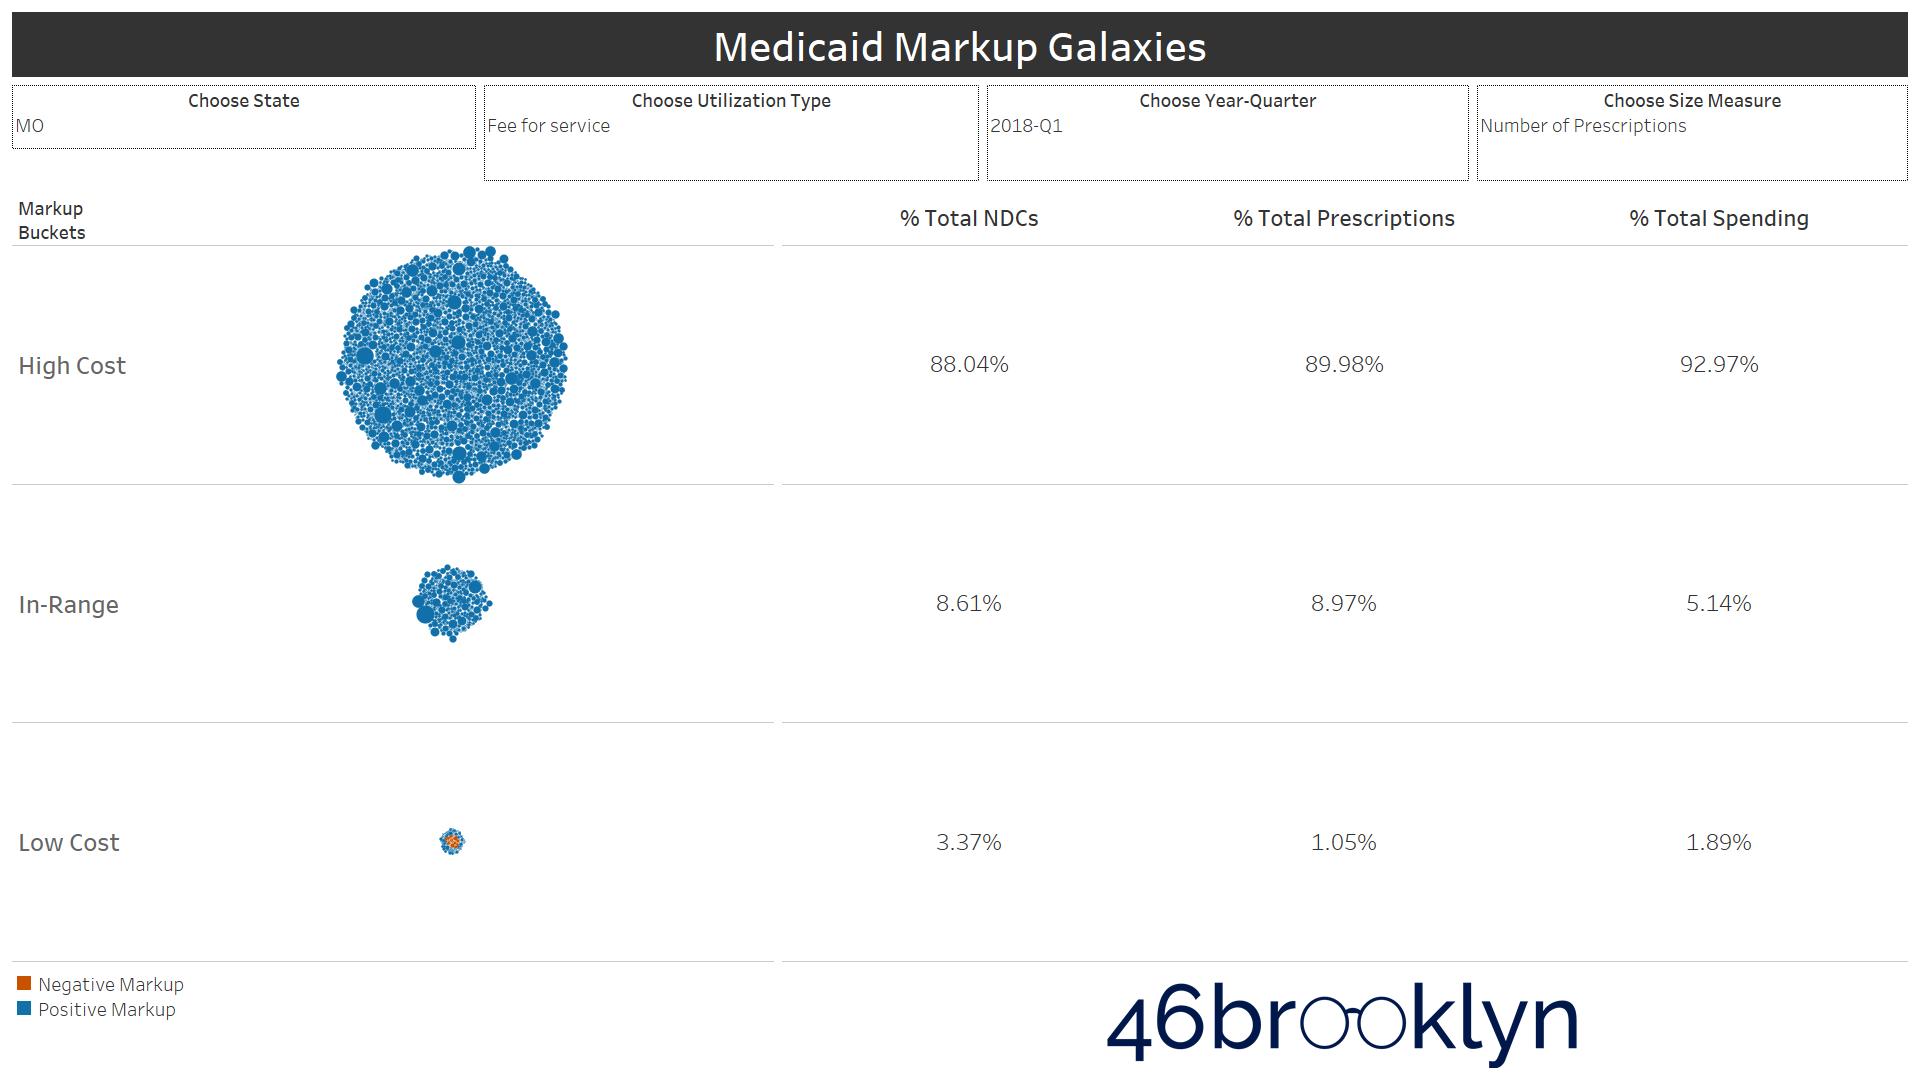 Figure 9   Source: Data.Medicaid.gov, 46brooklyn Research